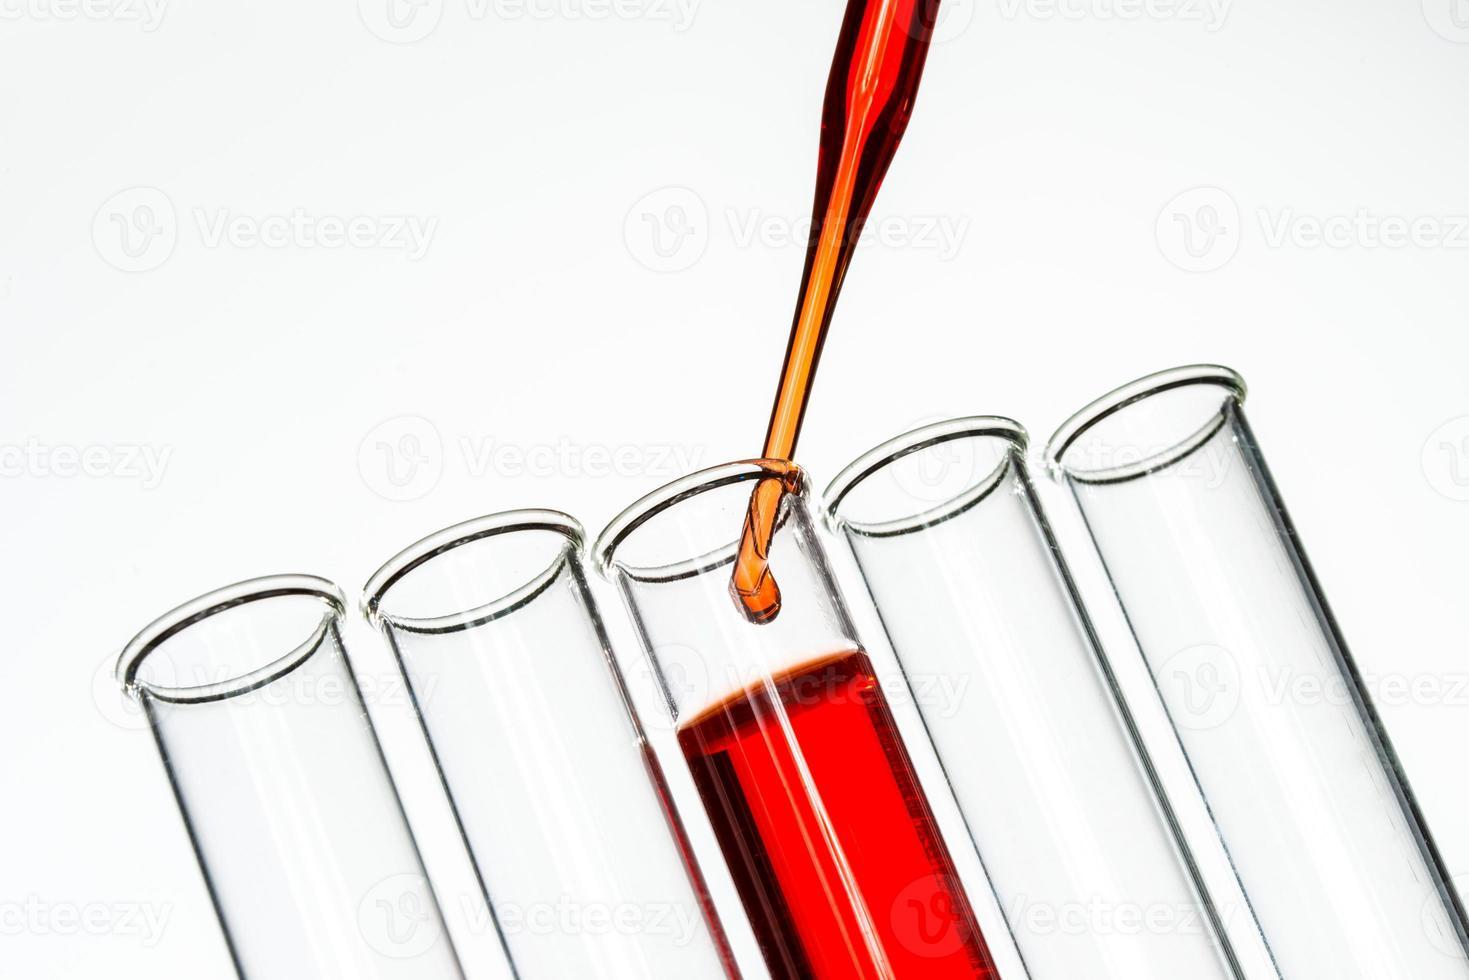 reageerbuisjes en pipet drop, laboratoriumglaswerk foto